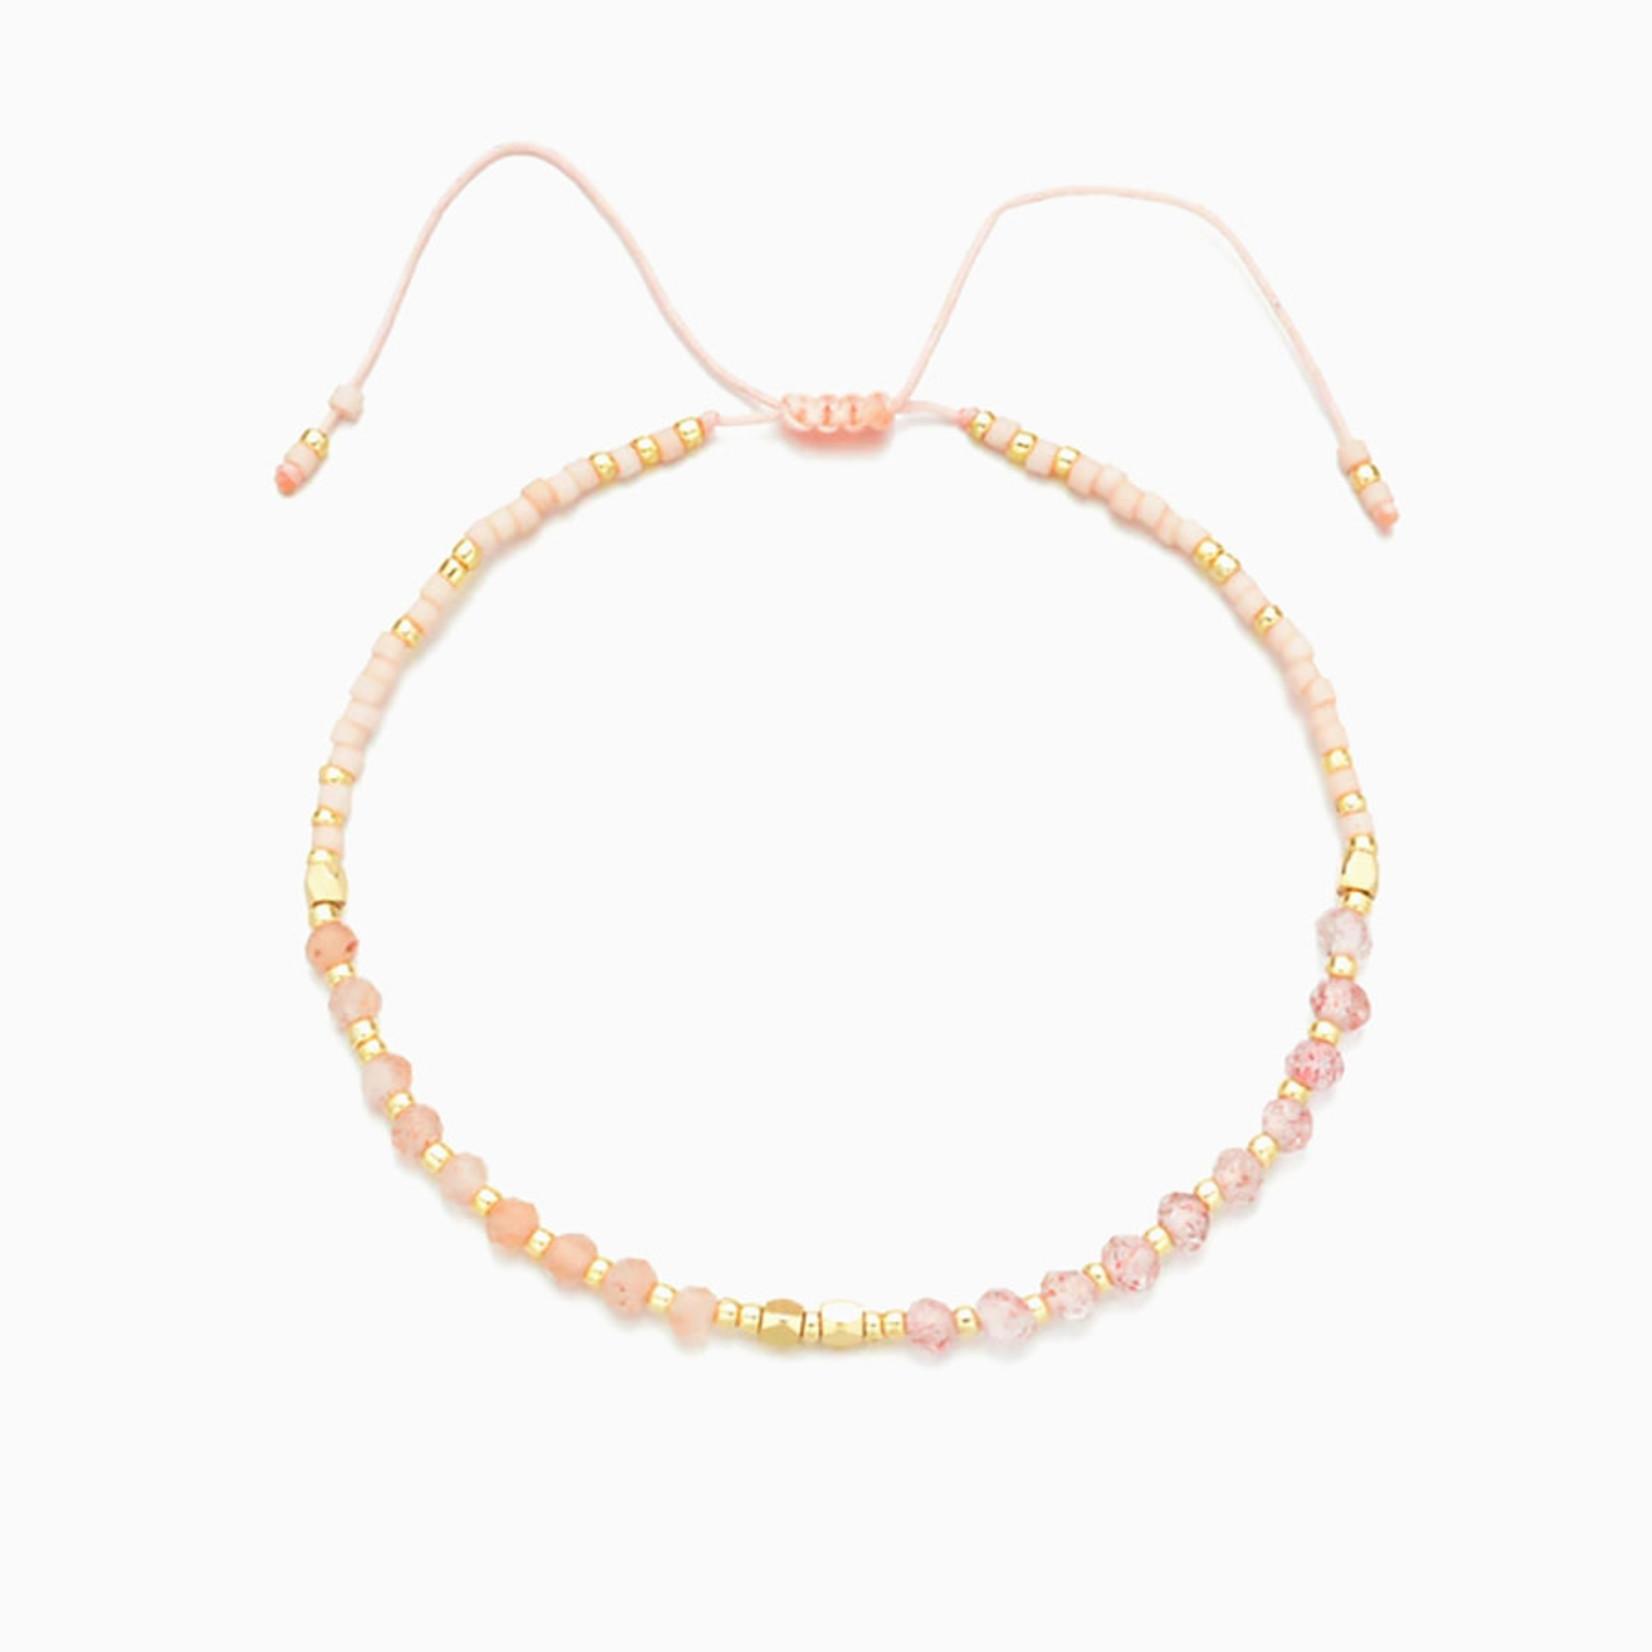 Kindred Row Healing Gemstone Stacking Bracelet